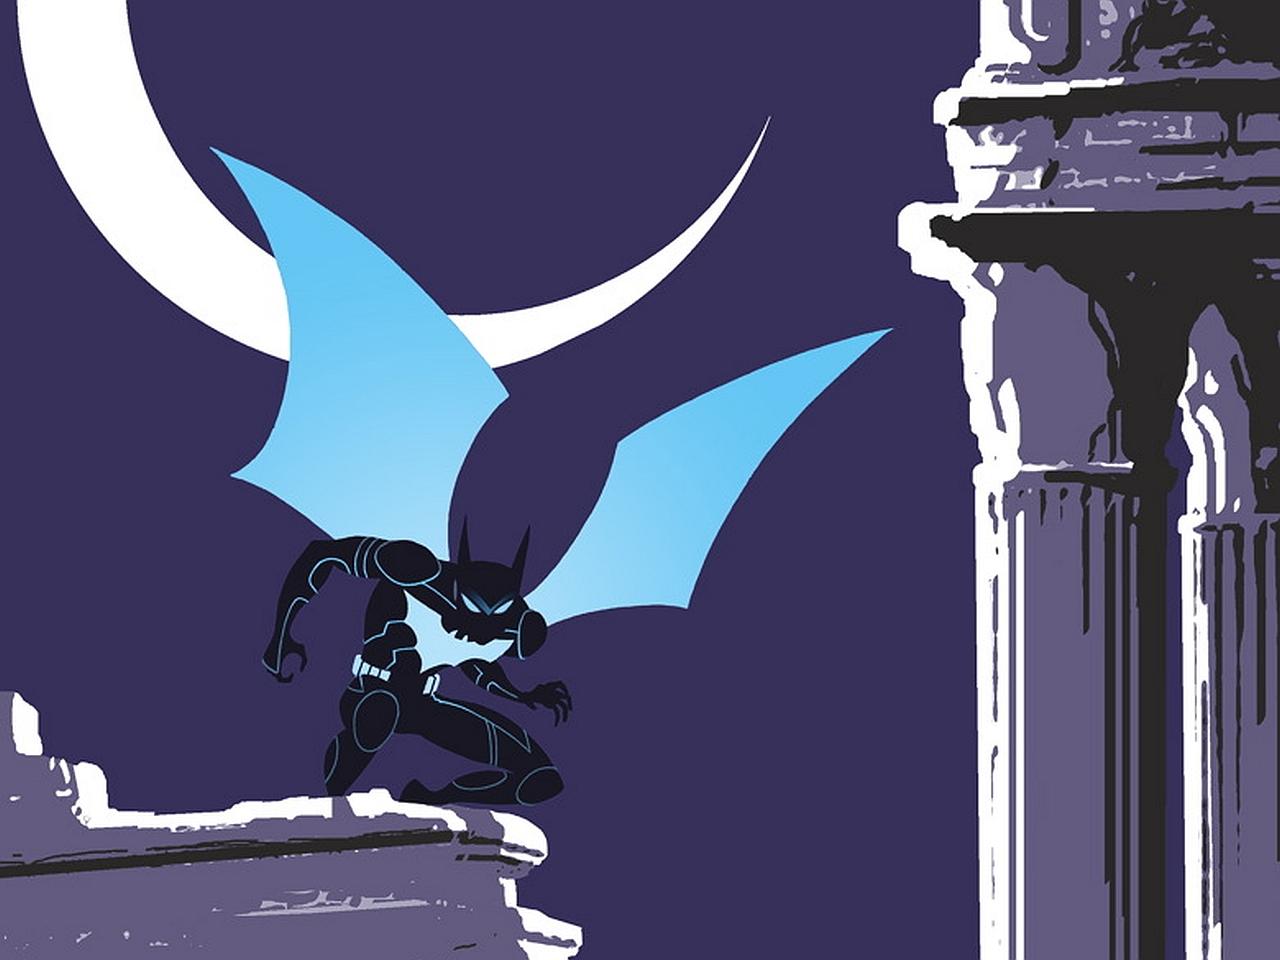 Batwing 1280x960